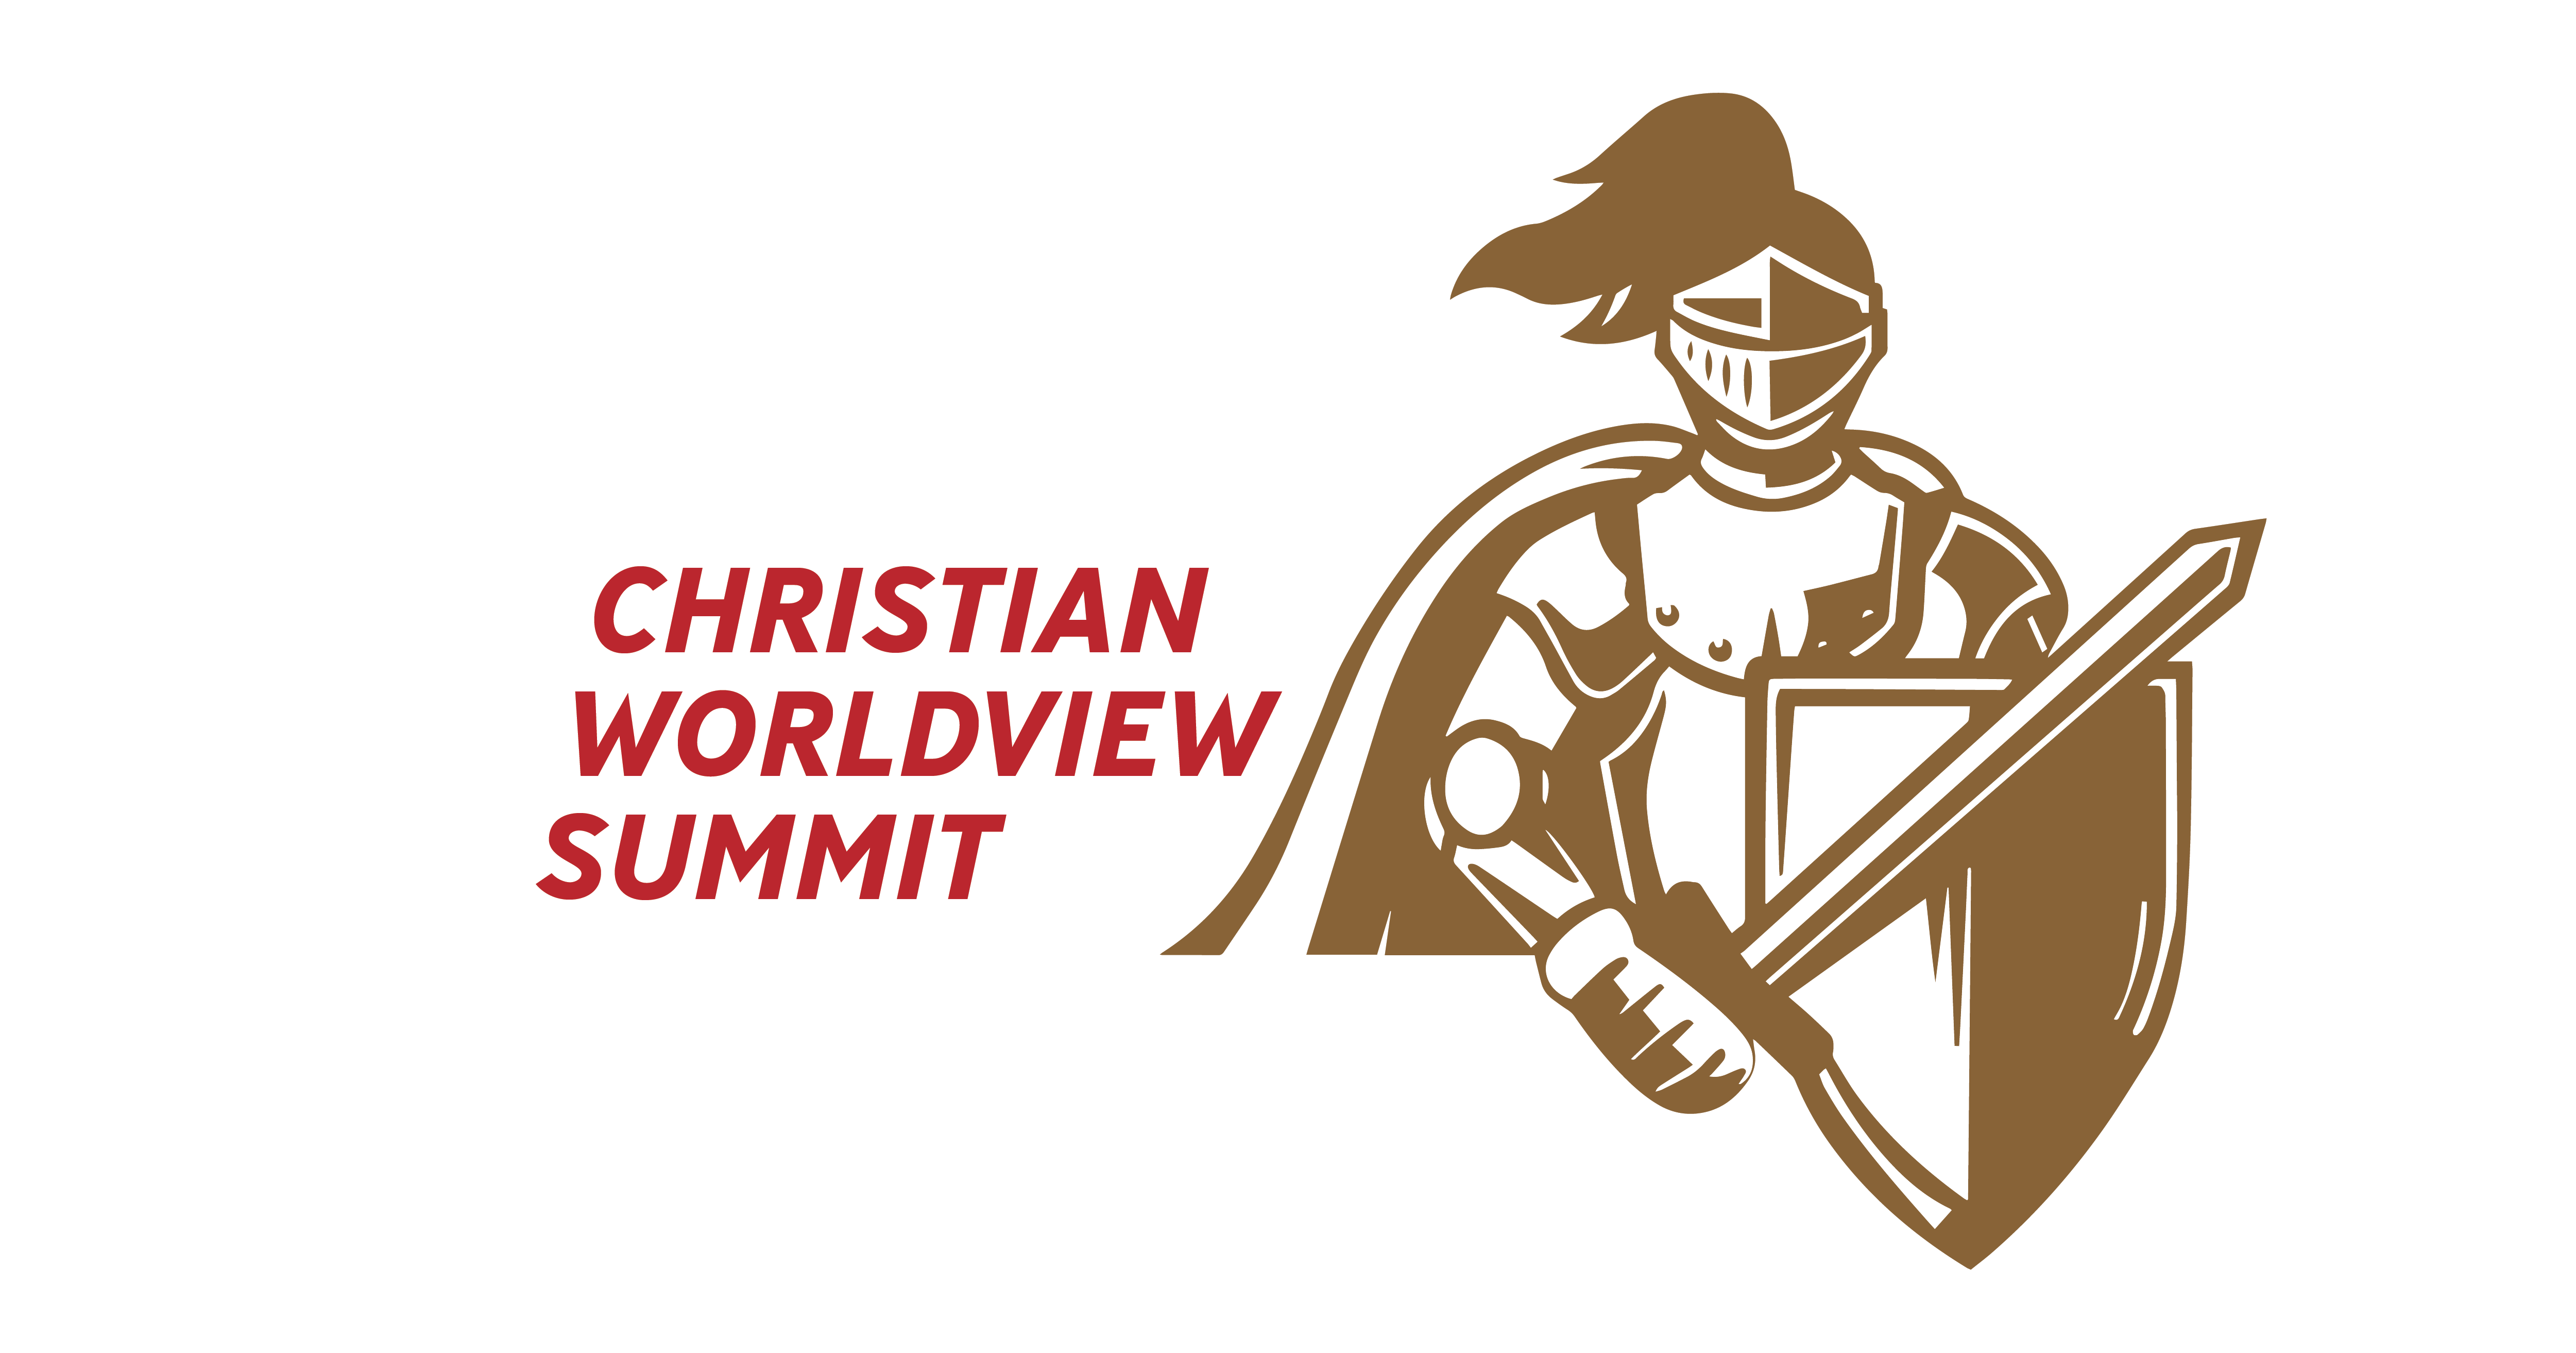 Christian Worldview Summit-01